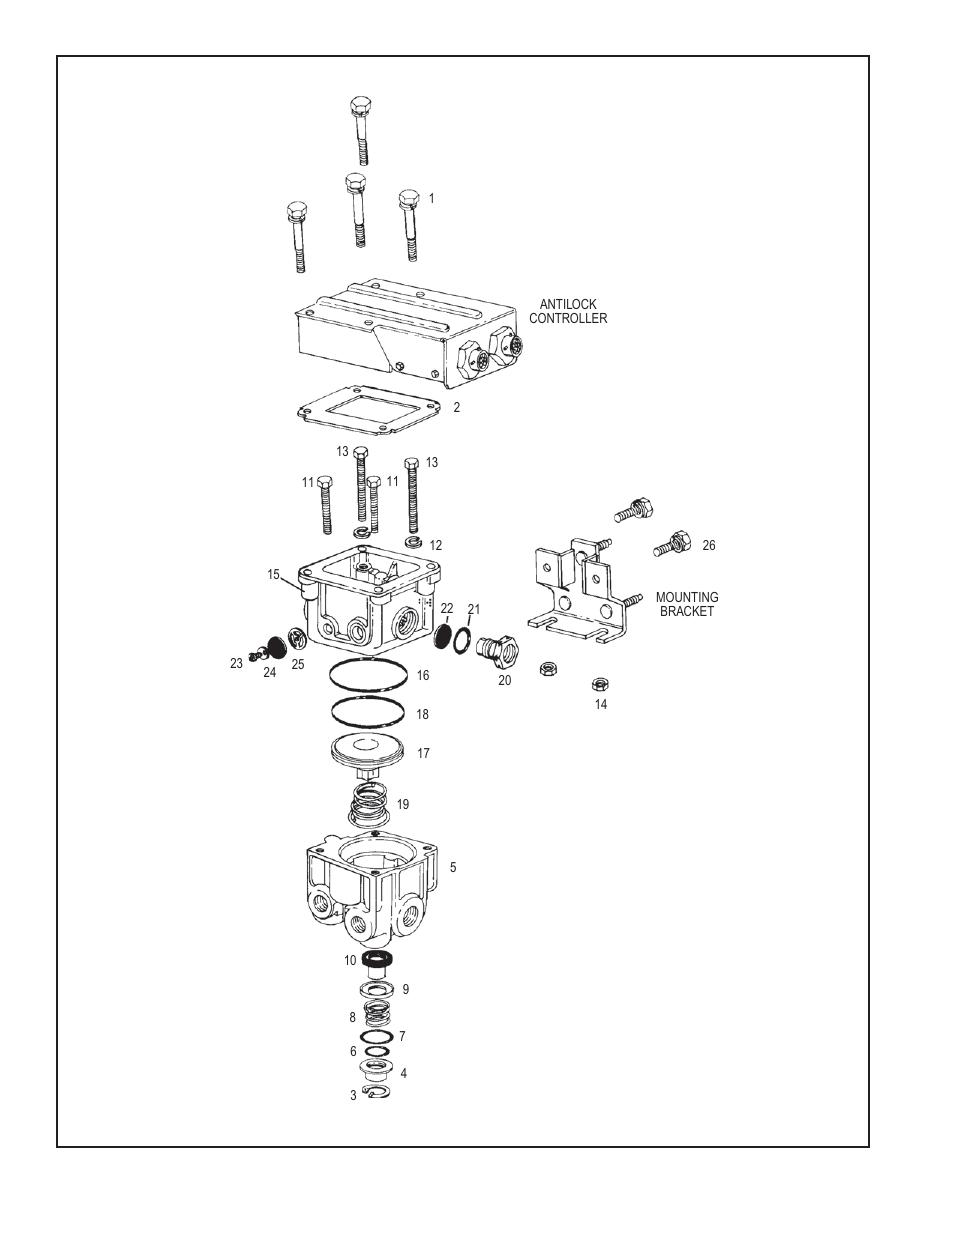 Bendix Commercial Vehicle Systems AR-1 ANTILOCK RELAY